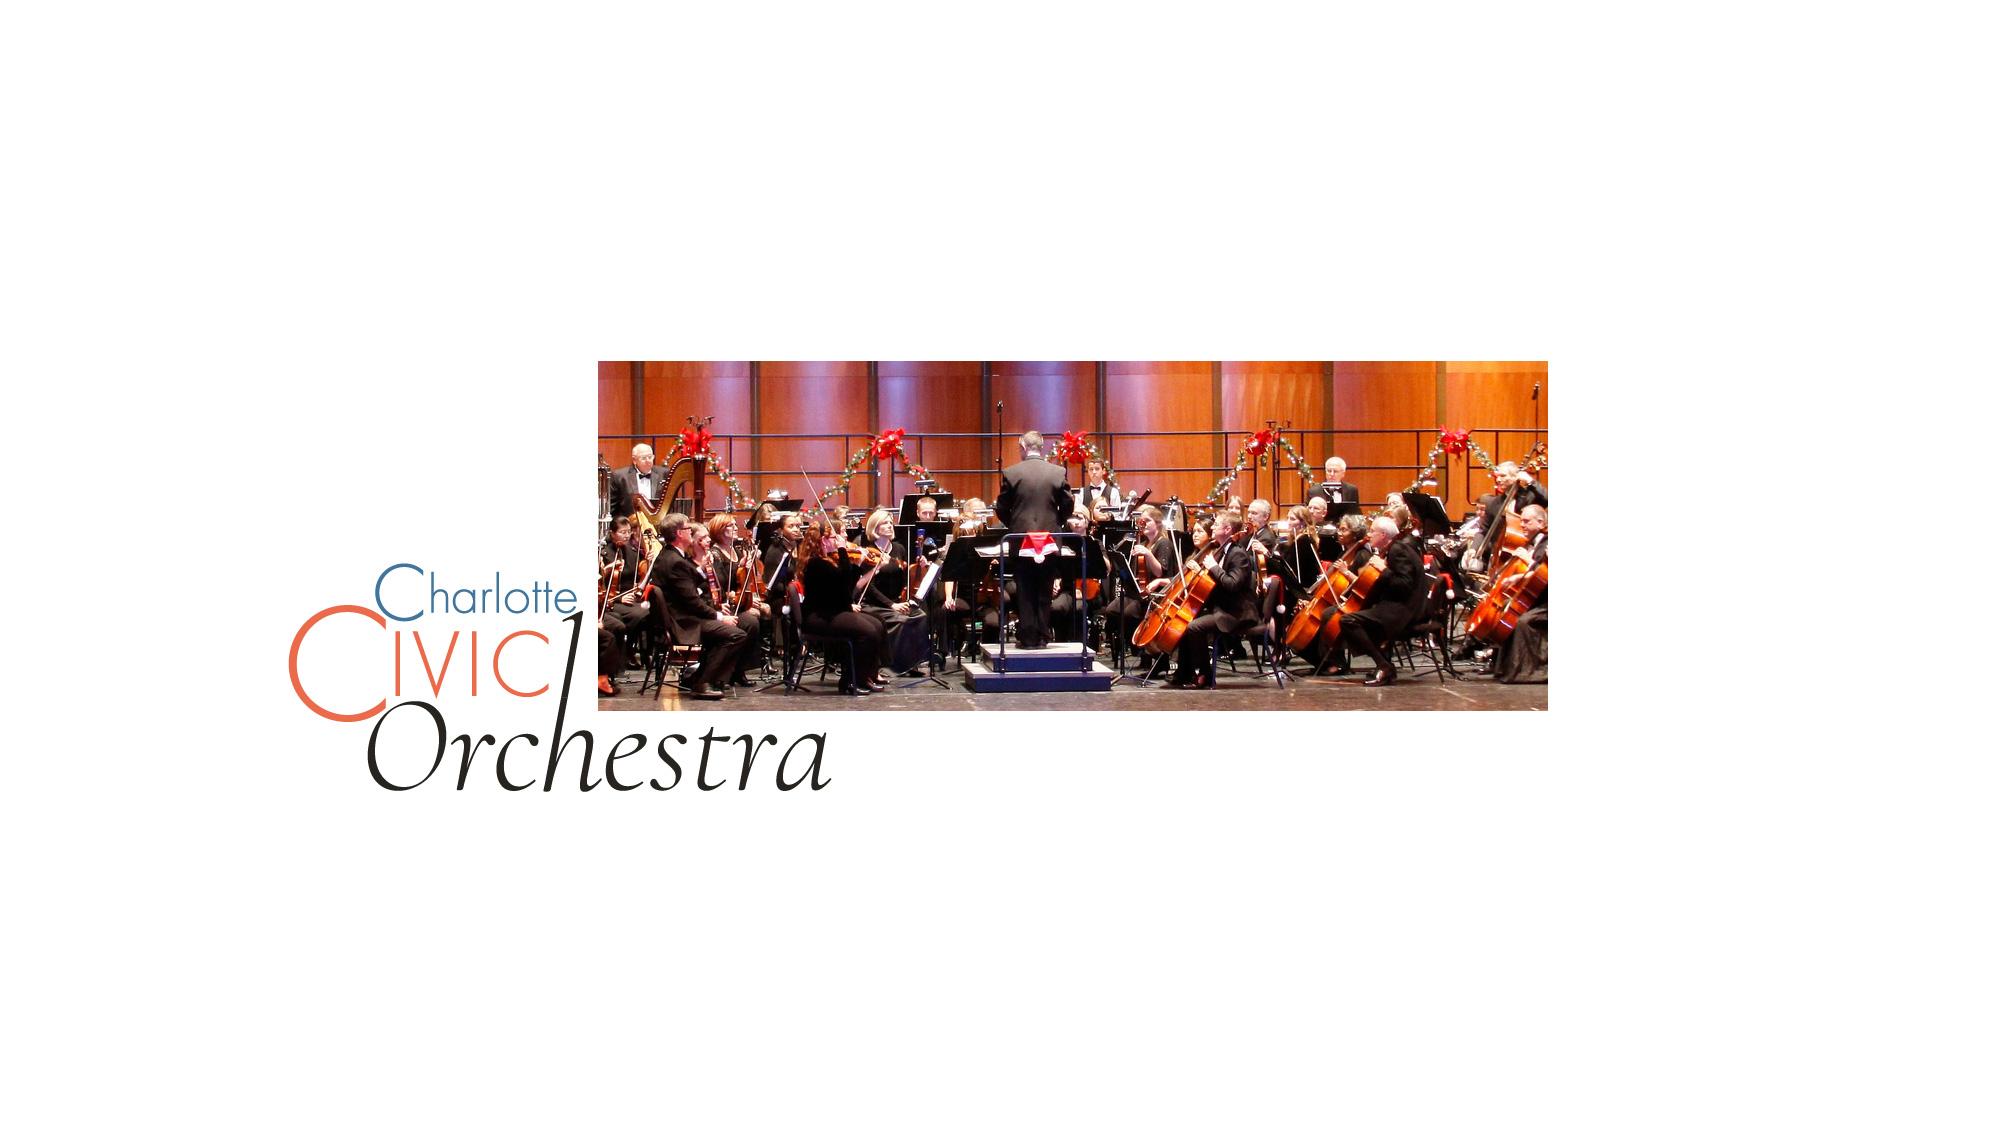 Charlotte Civic Orchestra ♫♫♫